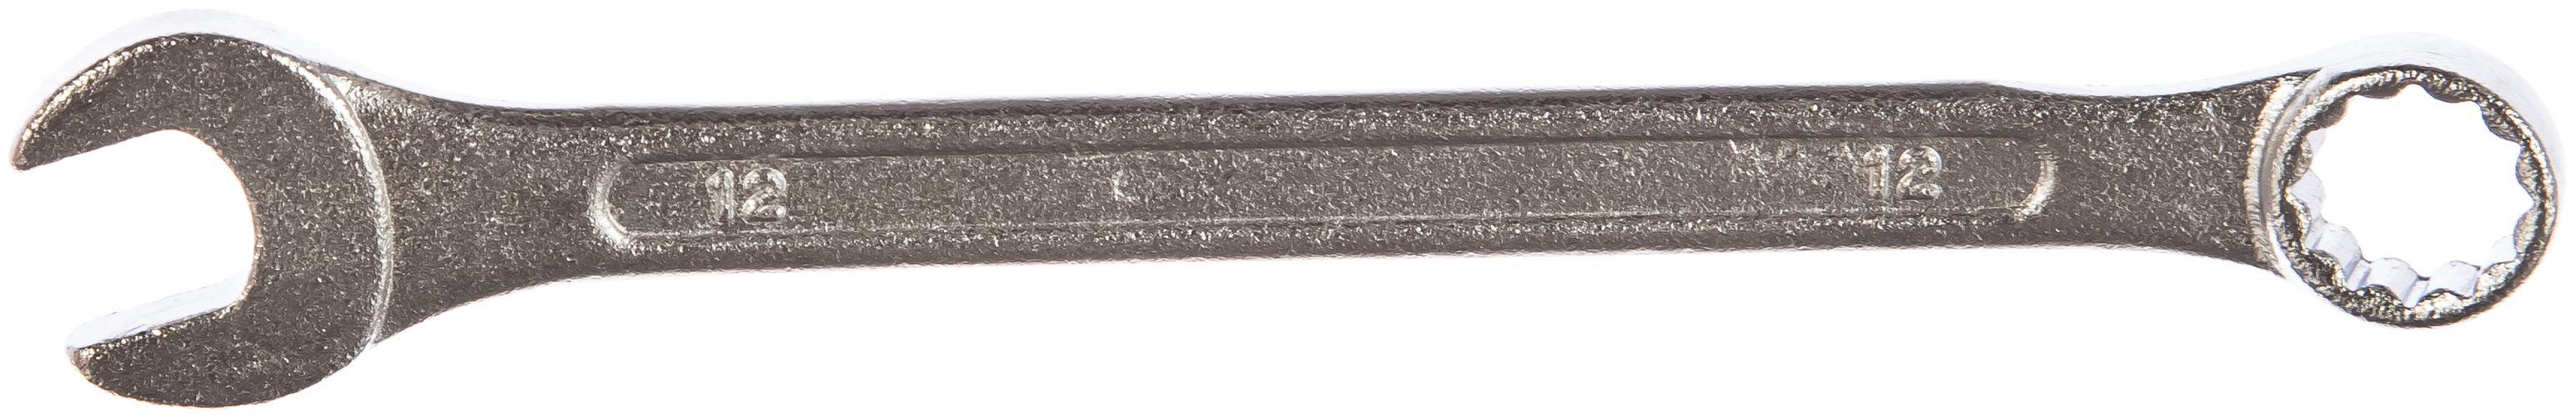 Ключ Biber 90637 (13 мм)